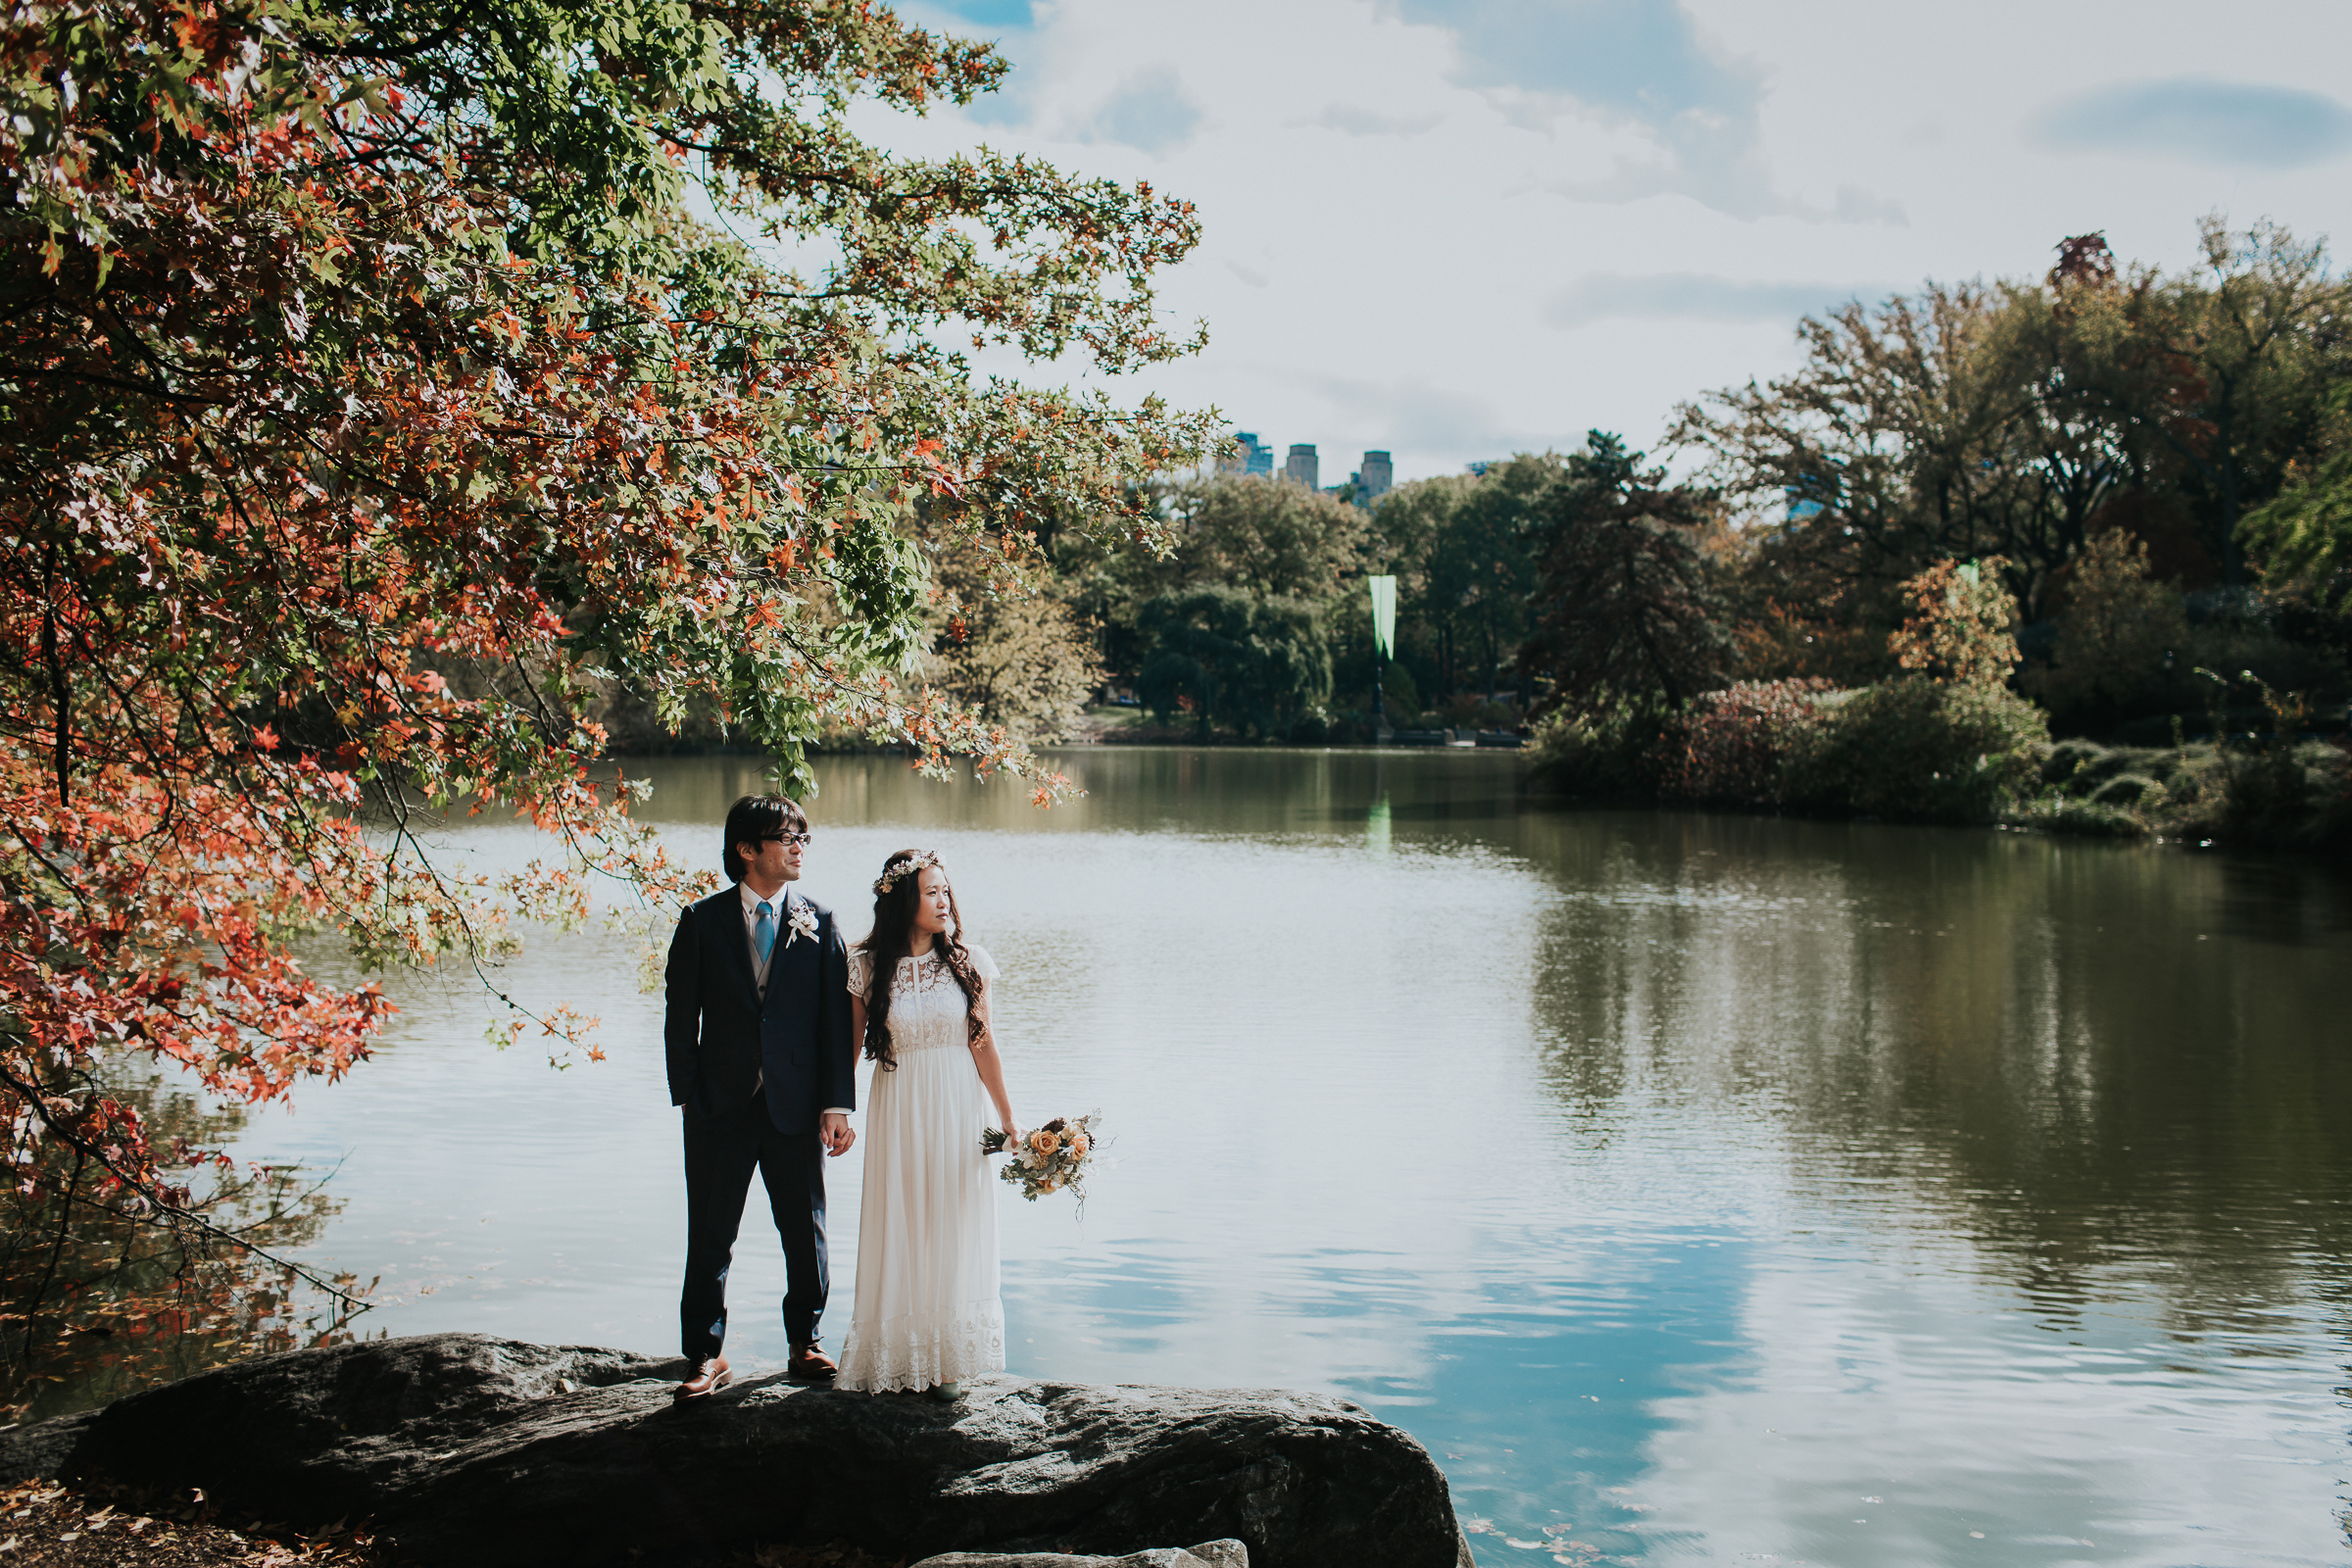 Central-Park-Brooklyn-Bridge-Dumbo-NYC-Documentary-Wedding-Photographer-49.jpg